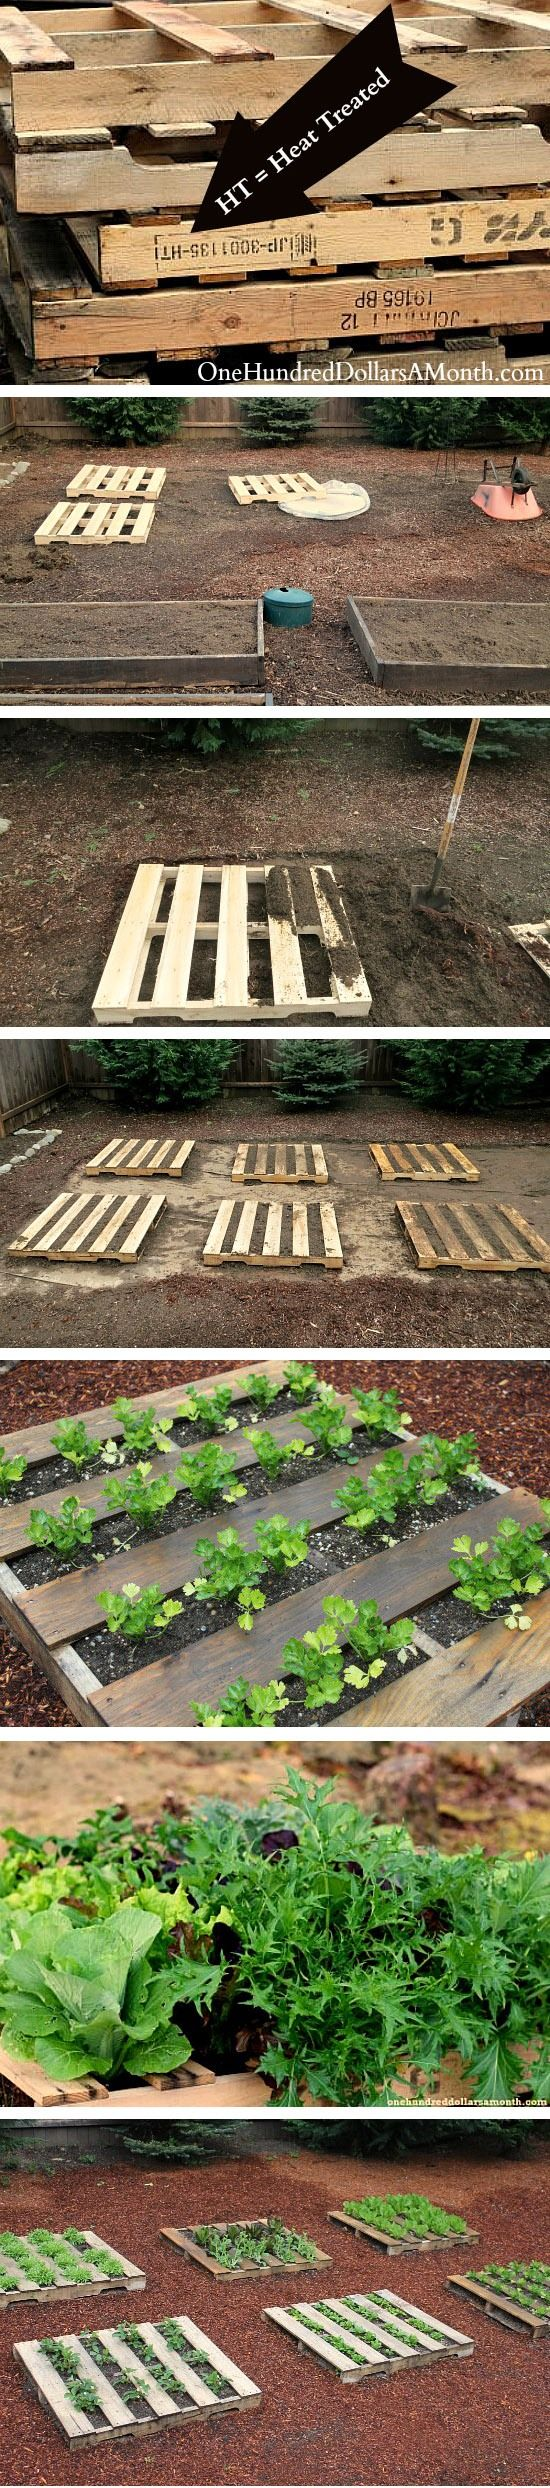 c mo reutilizar pal s para peque os cultivos mi sue o de. Black Bedroom Furniture Sets. Home Design Ideas